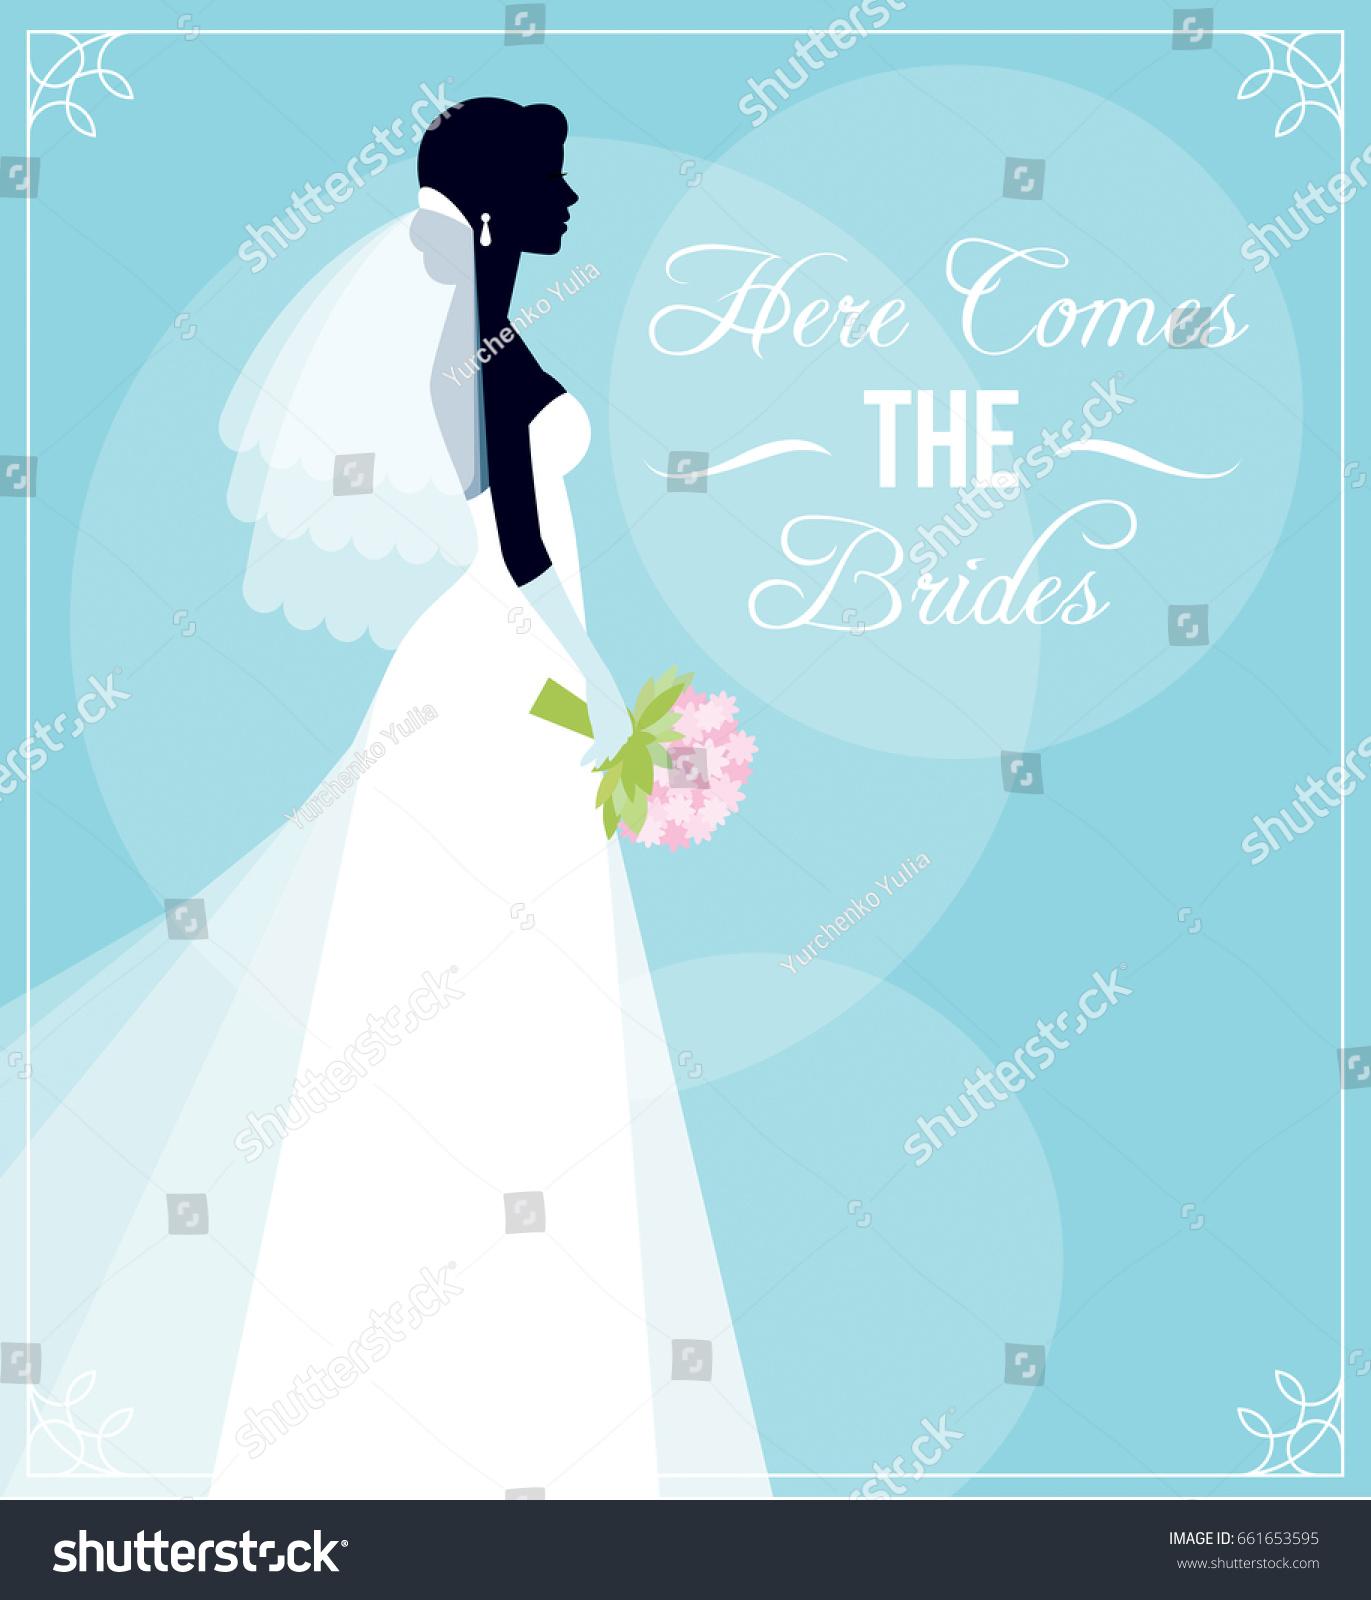 Template Flyer Bridal Shower Bachelorette Party Stock Vector Royalty Free 661653595,Wedding Sunflower Yellow Flower Girl Dresses